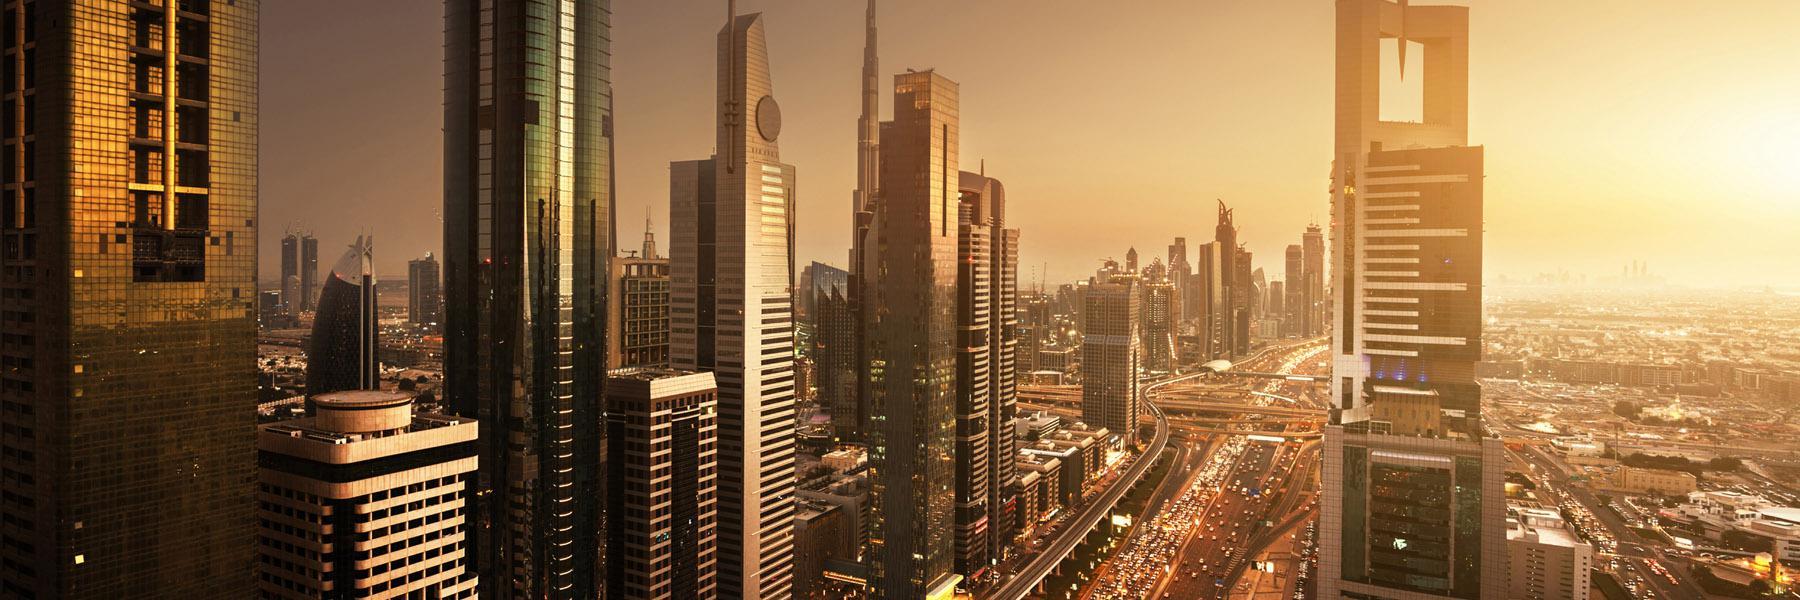 Scenic IRONMAN 70.3 Dubai